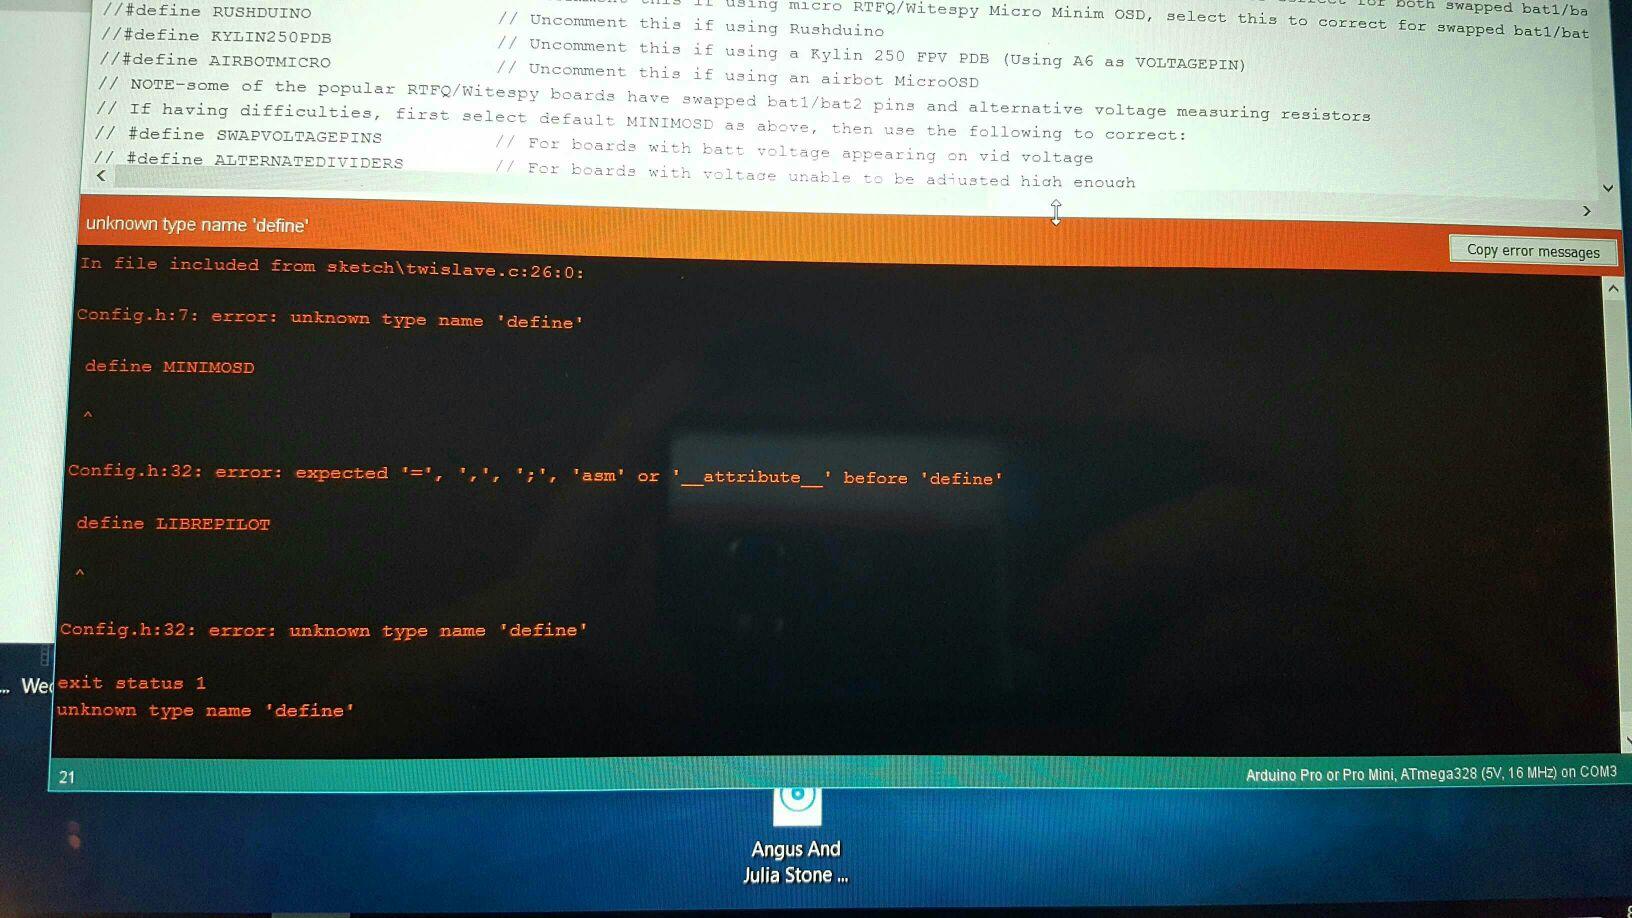 Kv team minimosd (not micro) problem  Waiting for mavlink